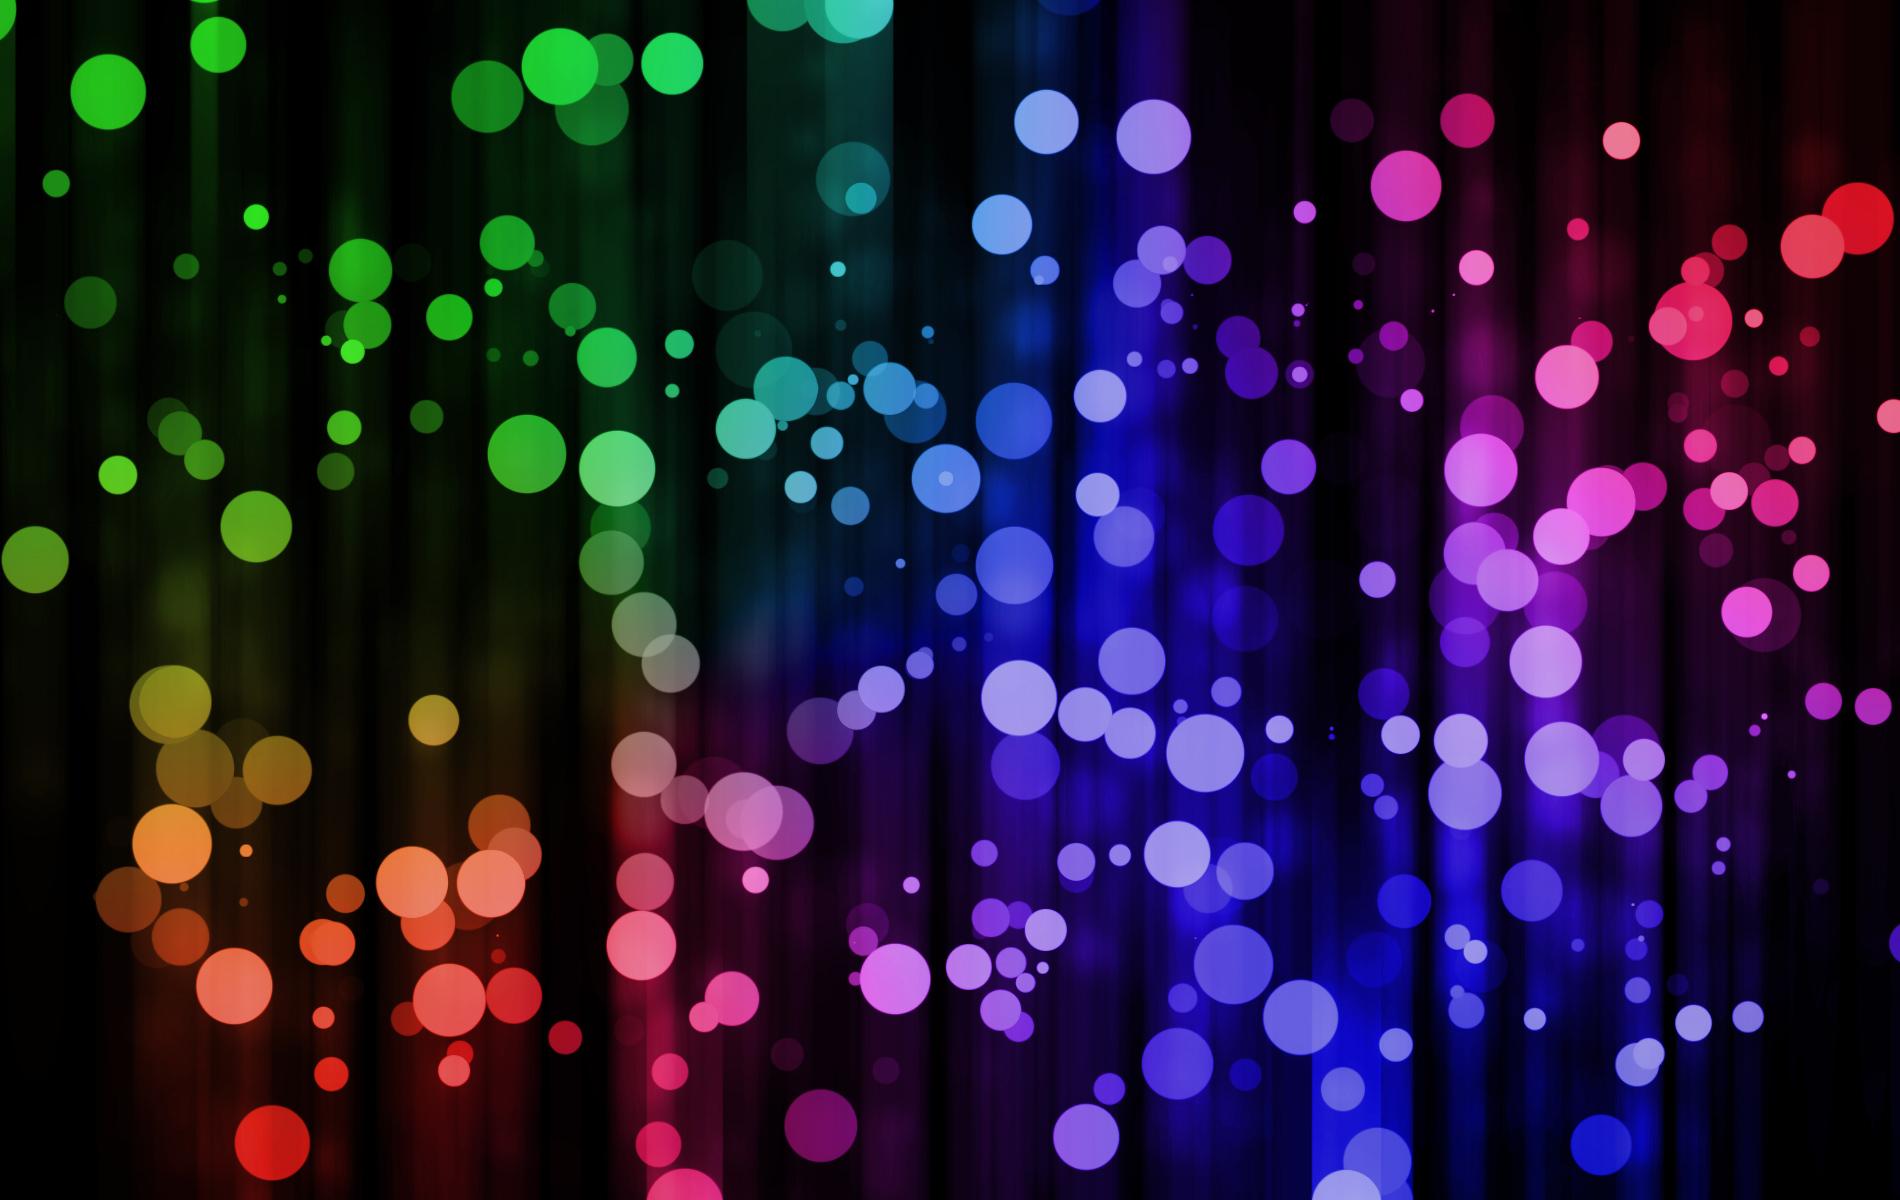 Pretty Colorful Desktop Backgrounds 1900x1200